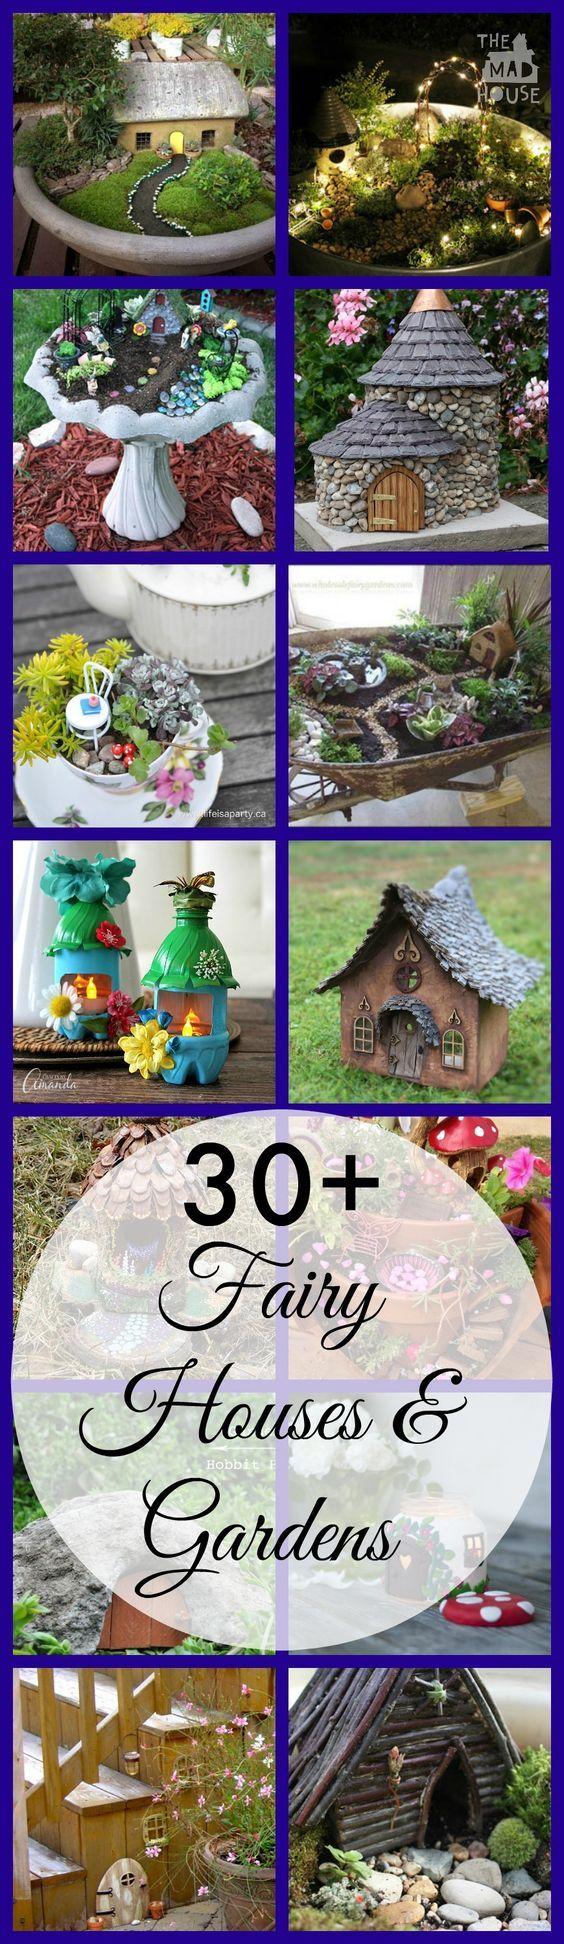 Fabulous Fairy Gardens and Houses